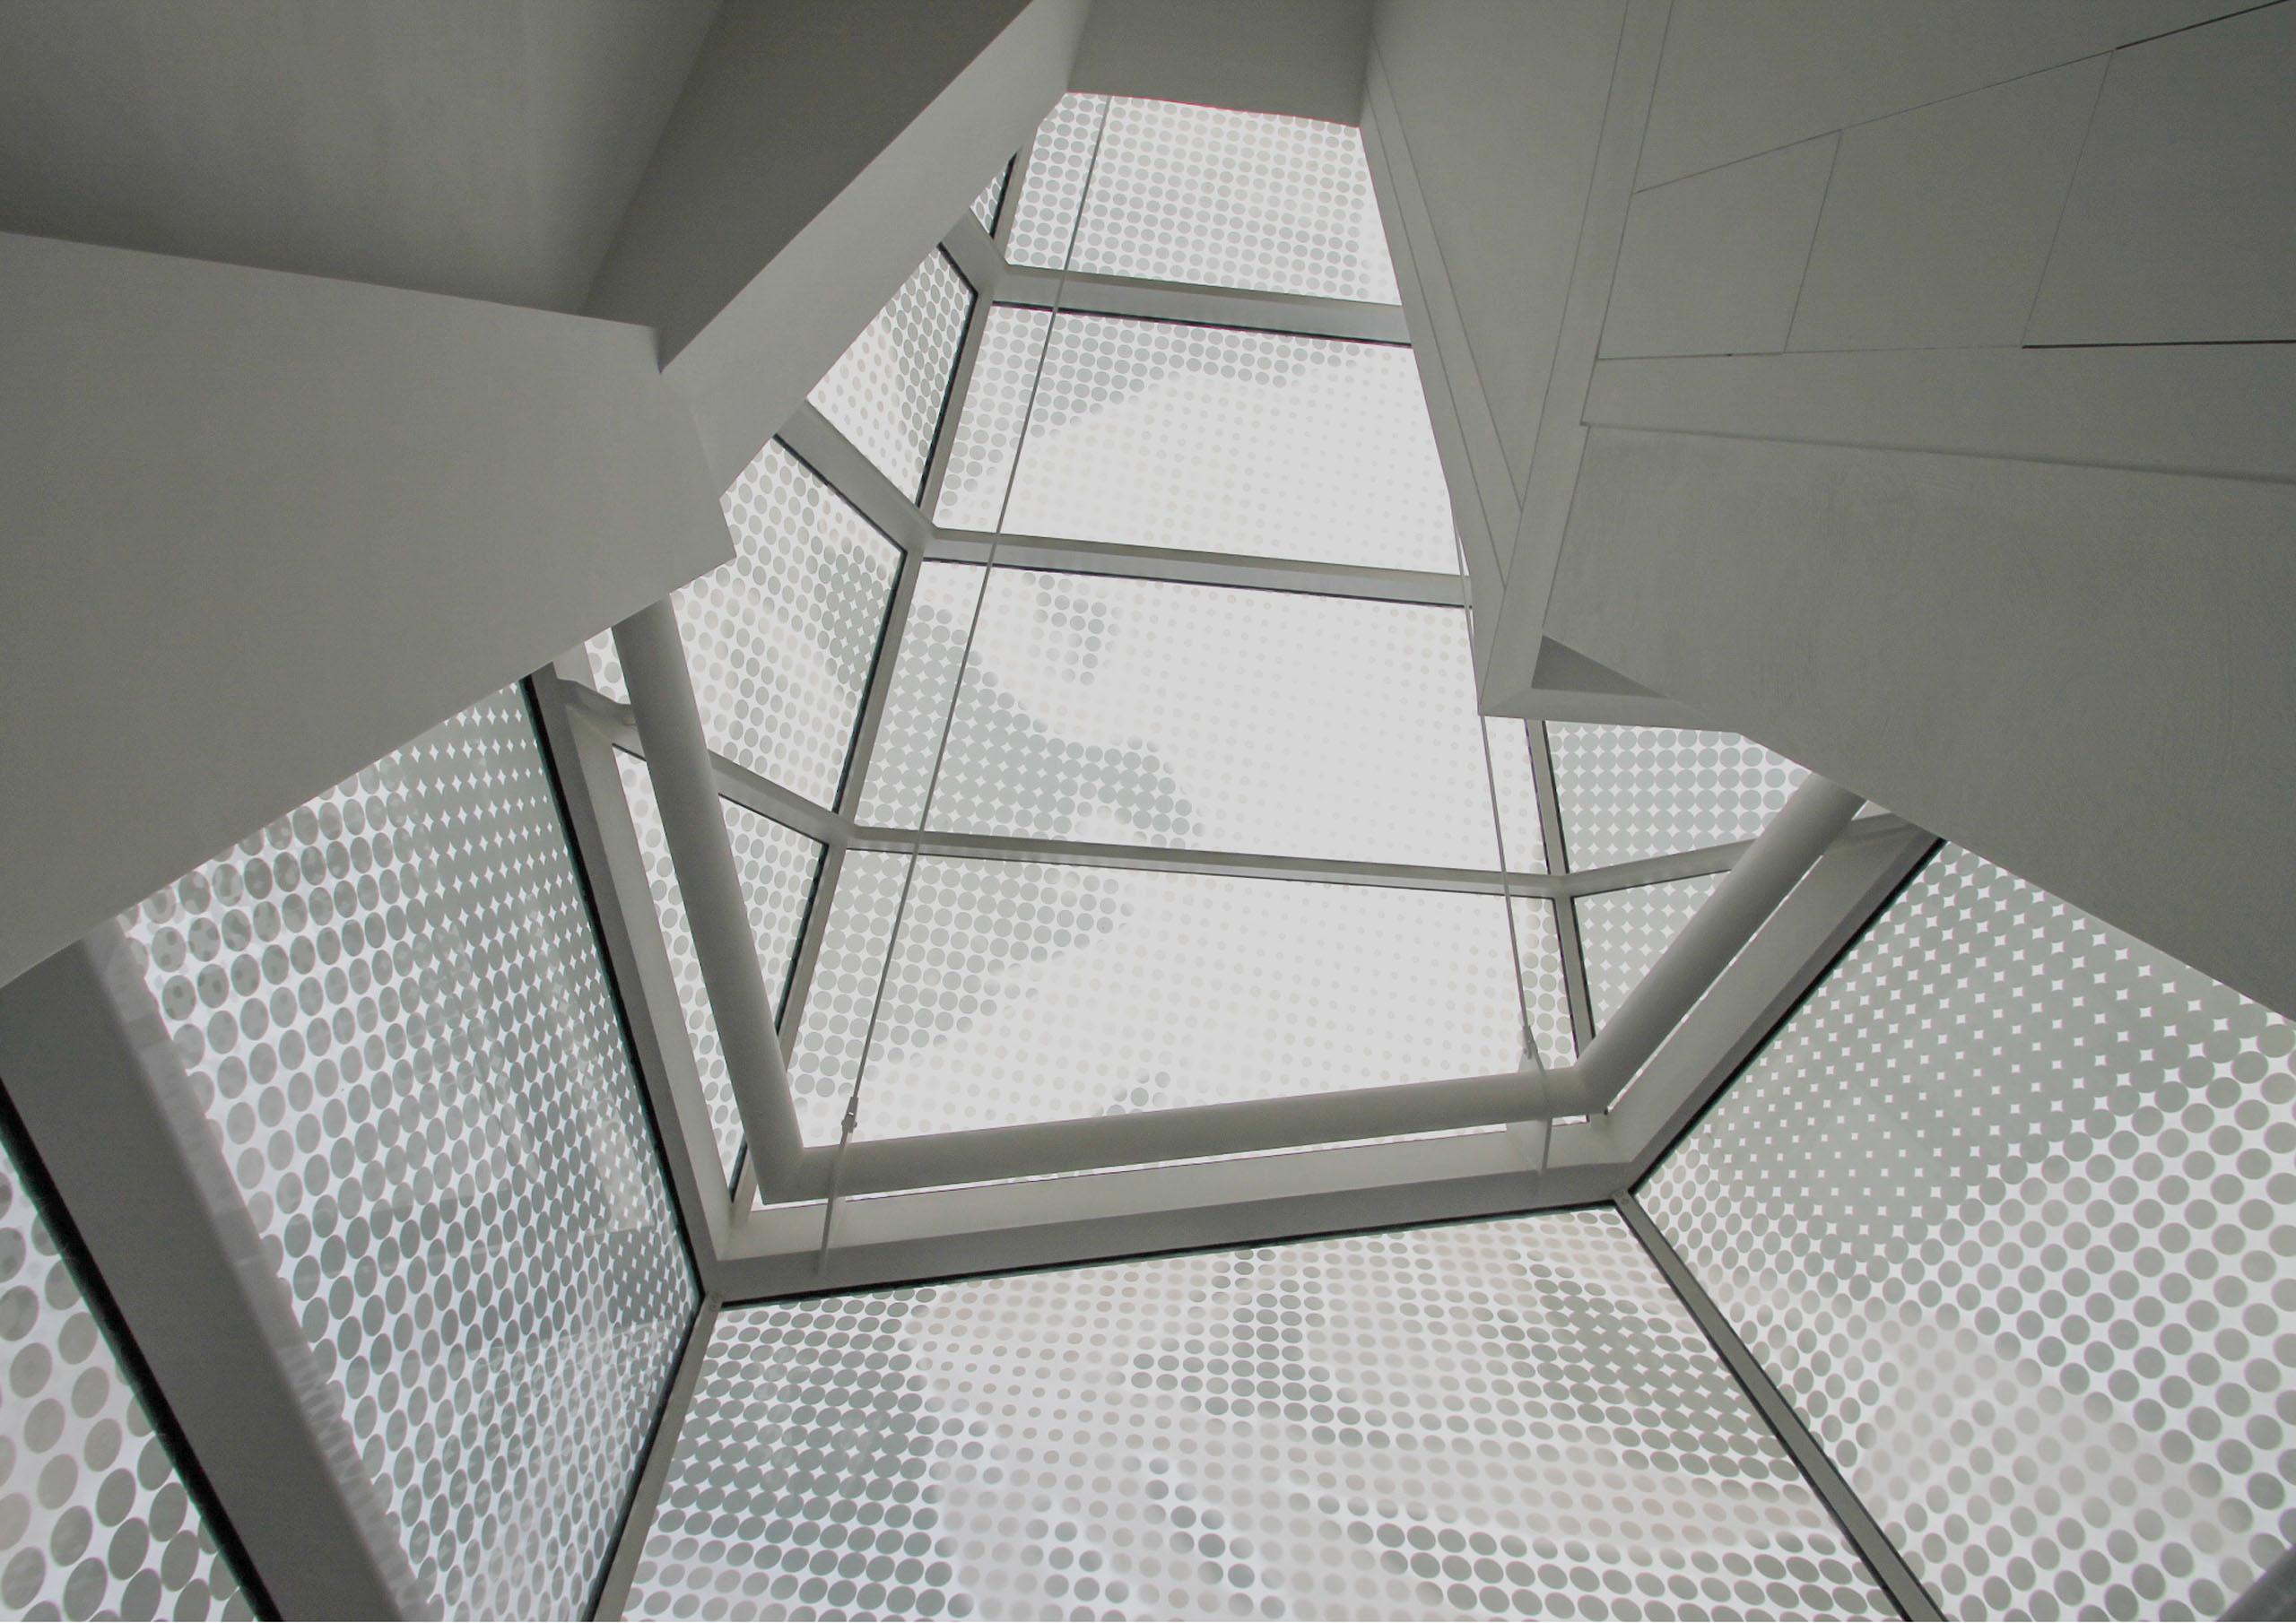 https://www.architektur-fassade.de/wp-content/uploads/2021/02/14102_CSM.jpg